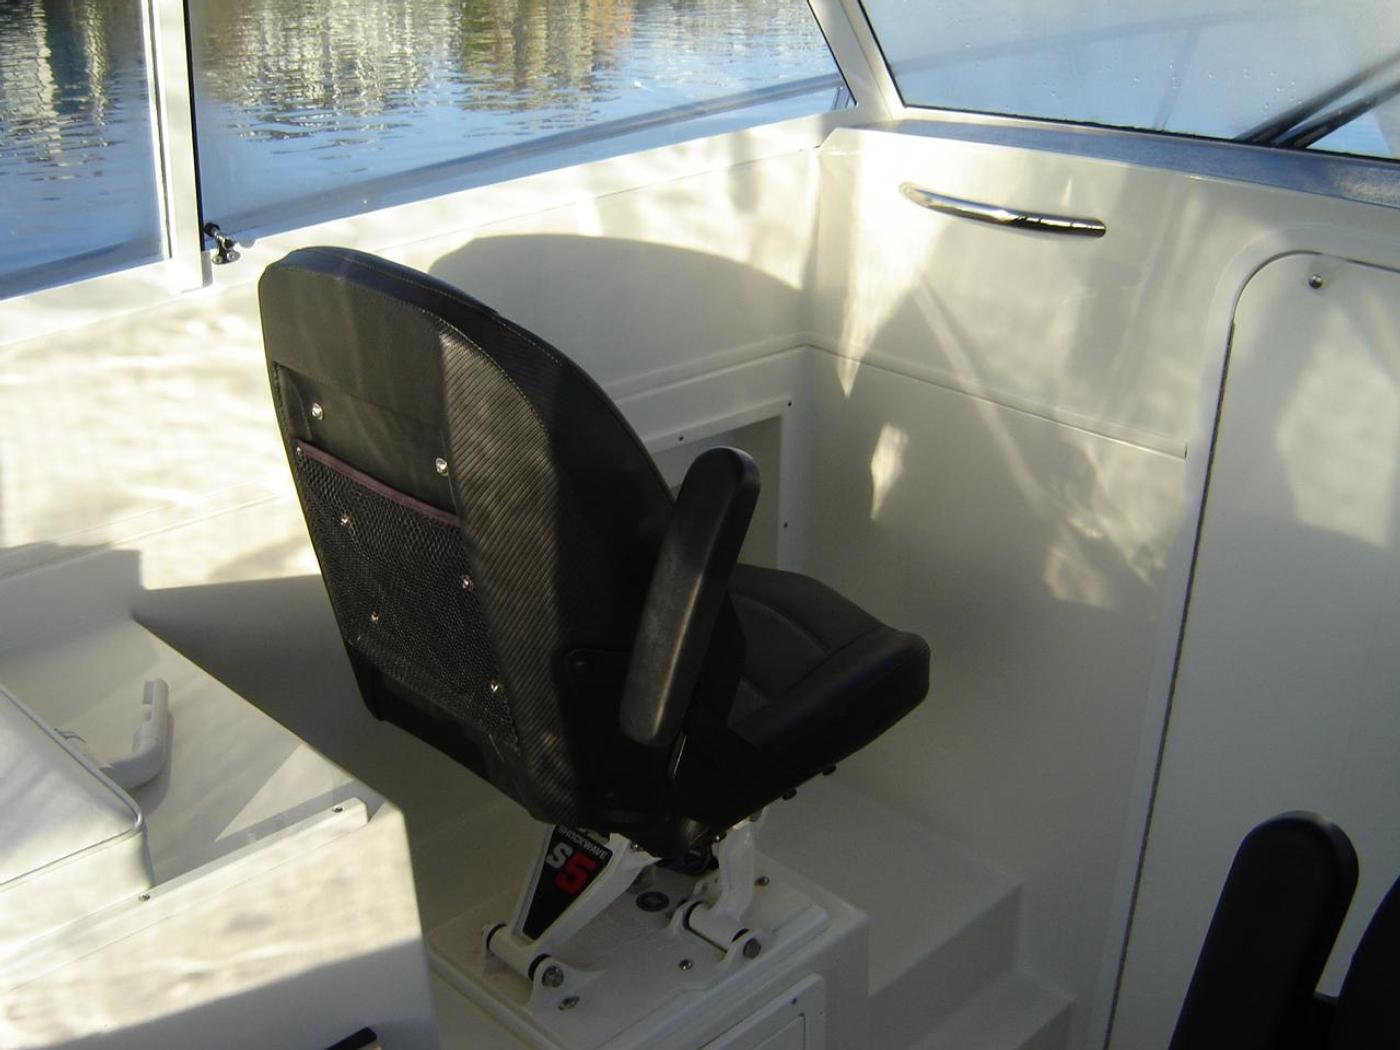 2019 Monaro 235 Sport, Passenger Seat to Port